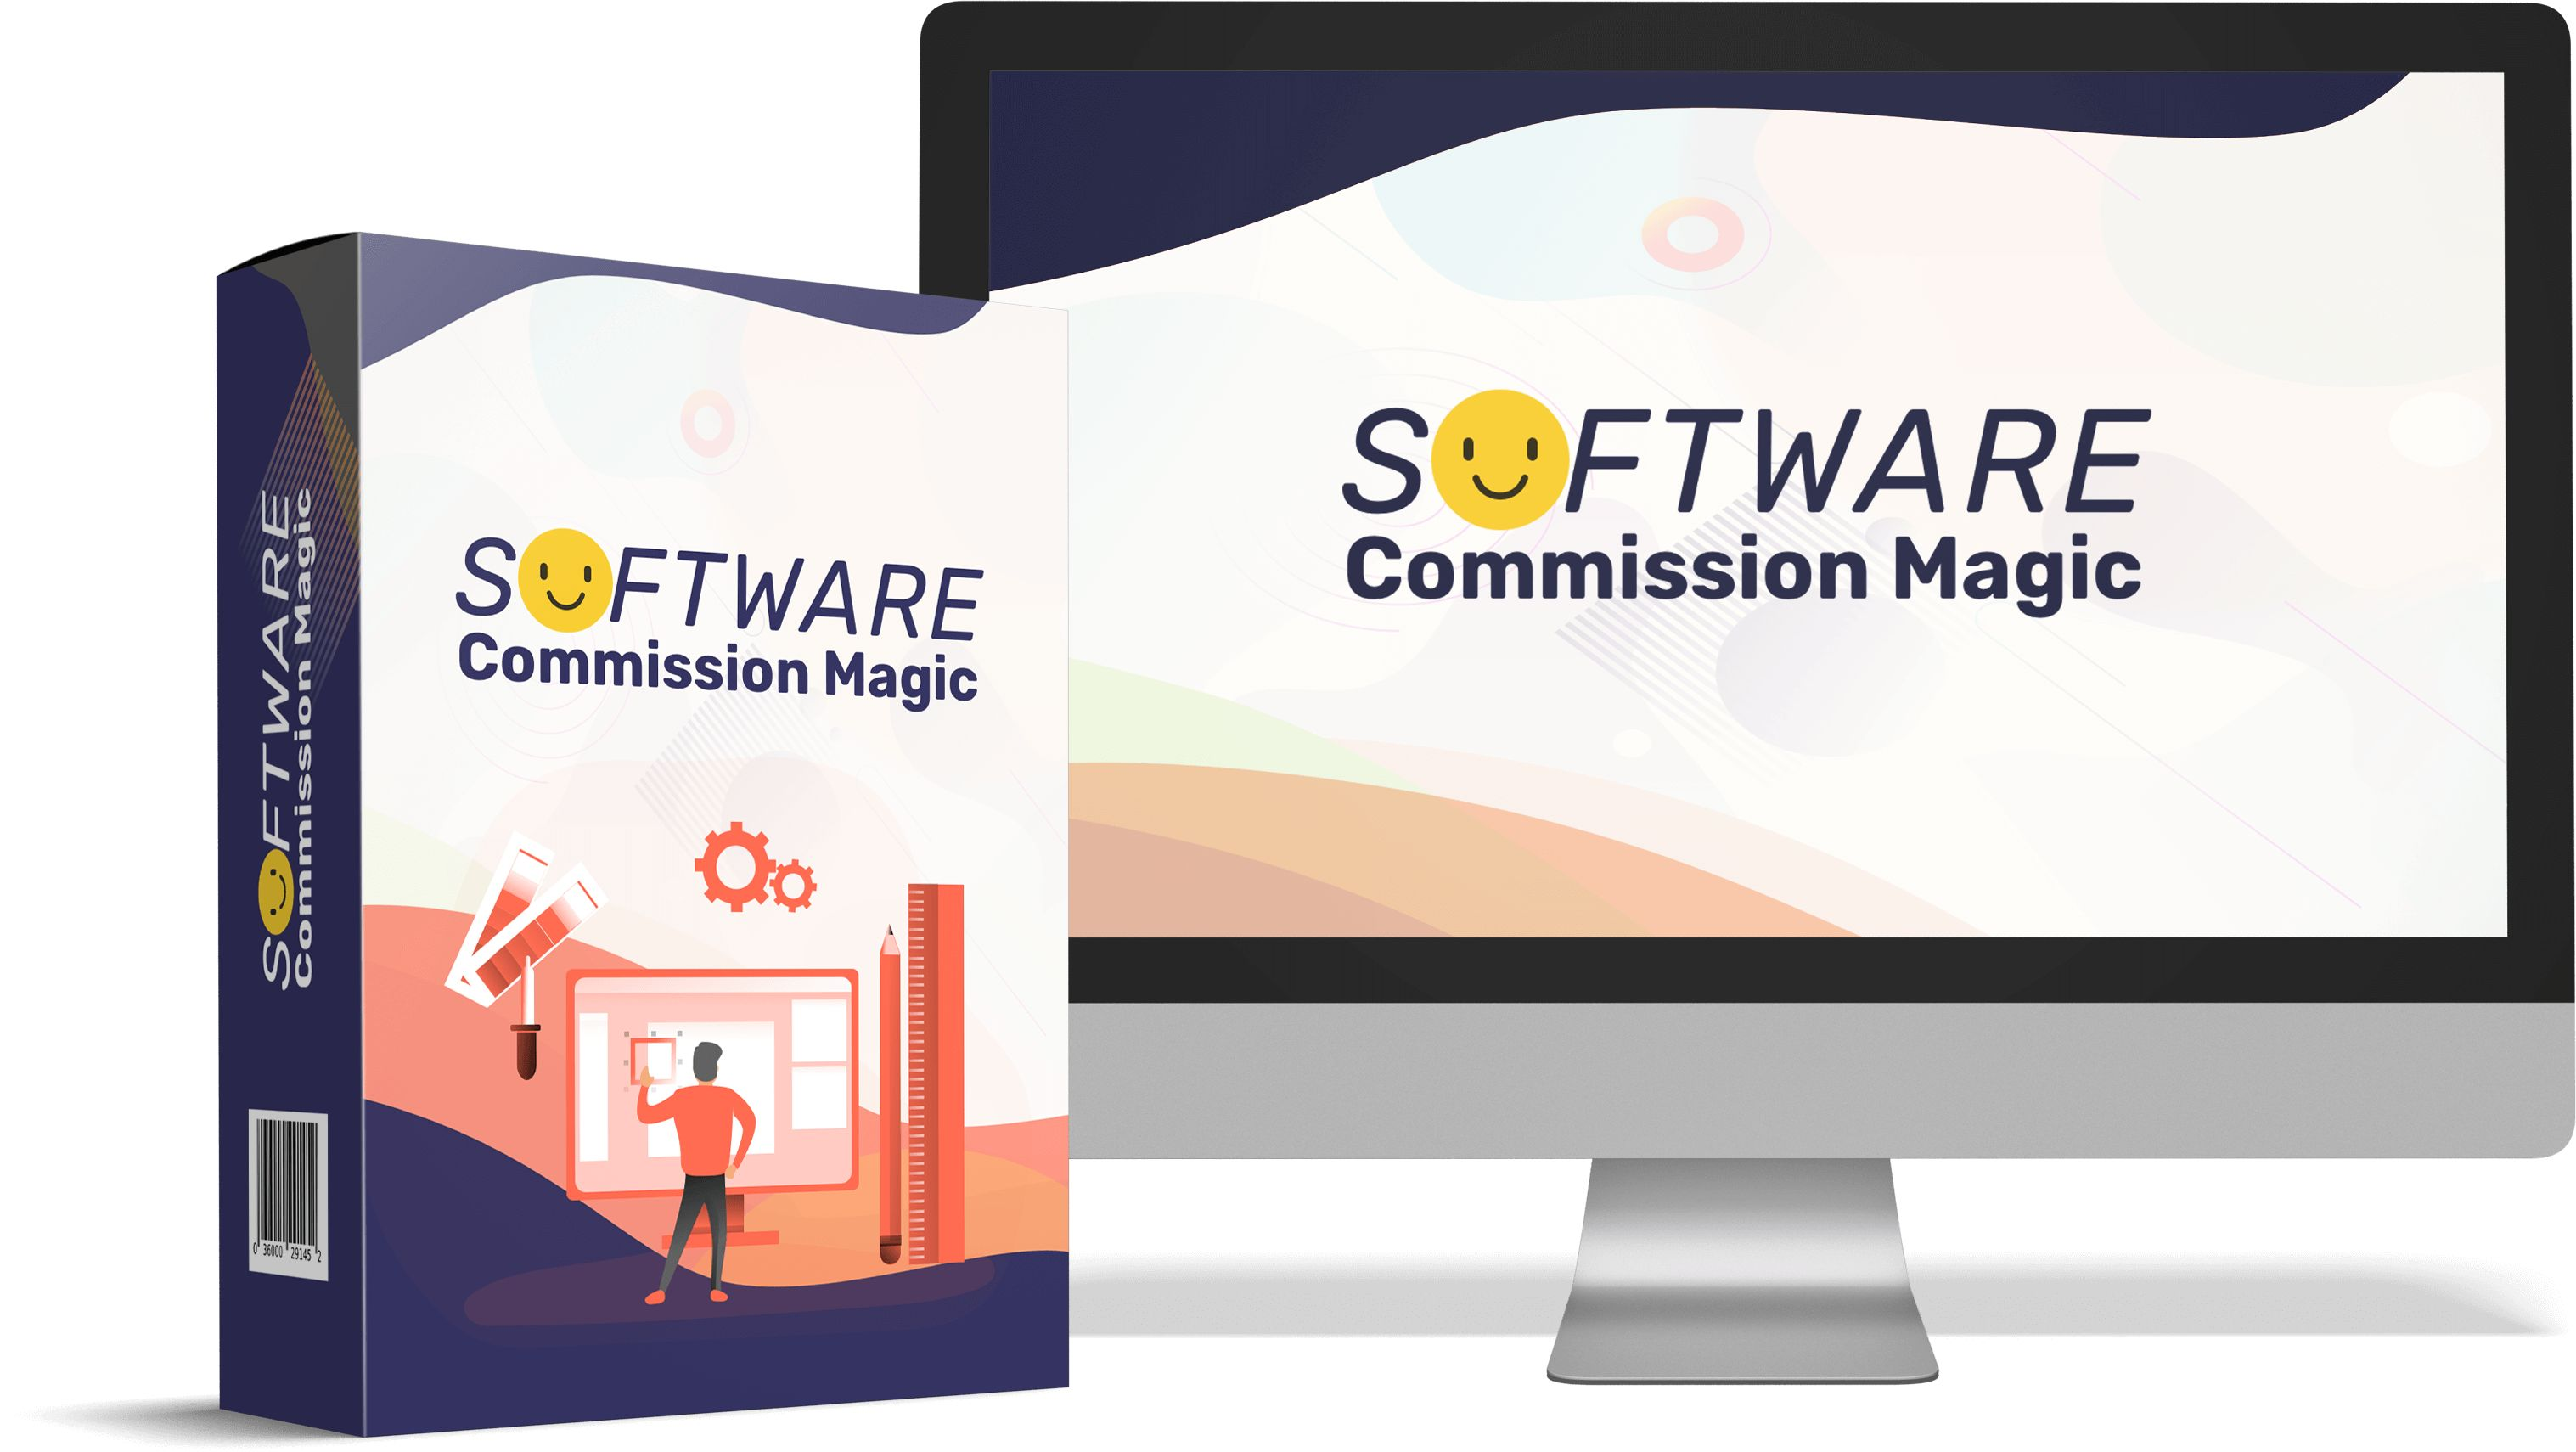 Software Commission Magic